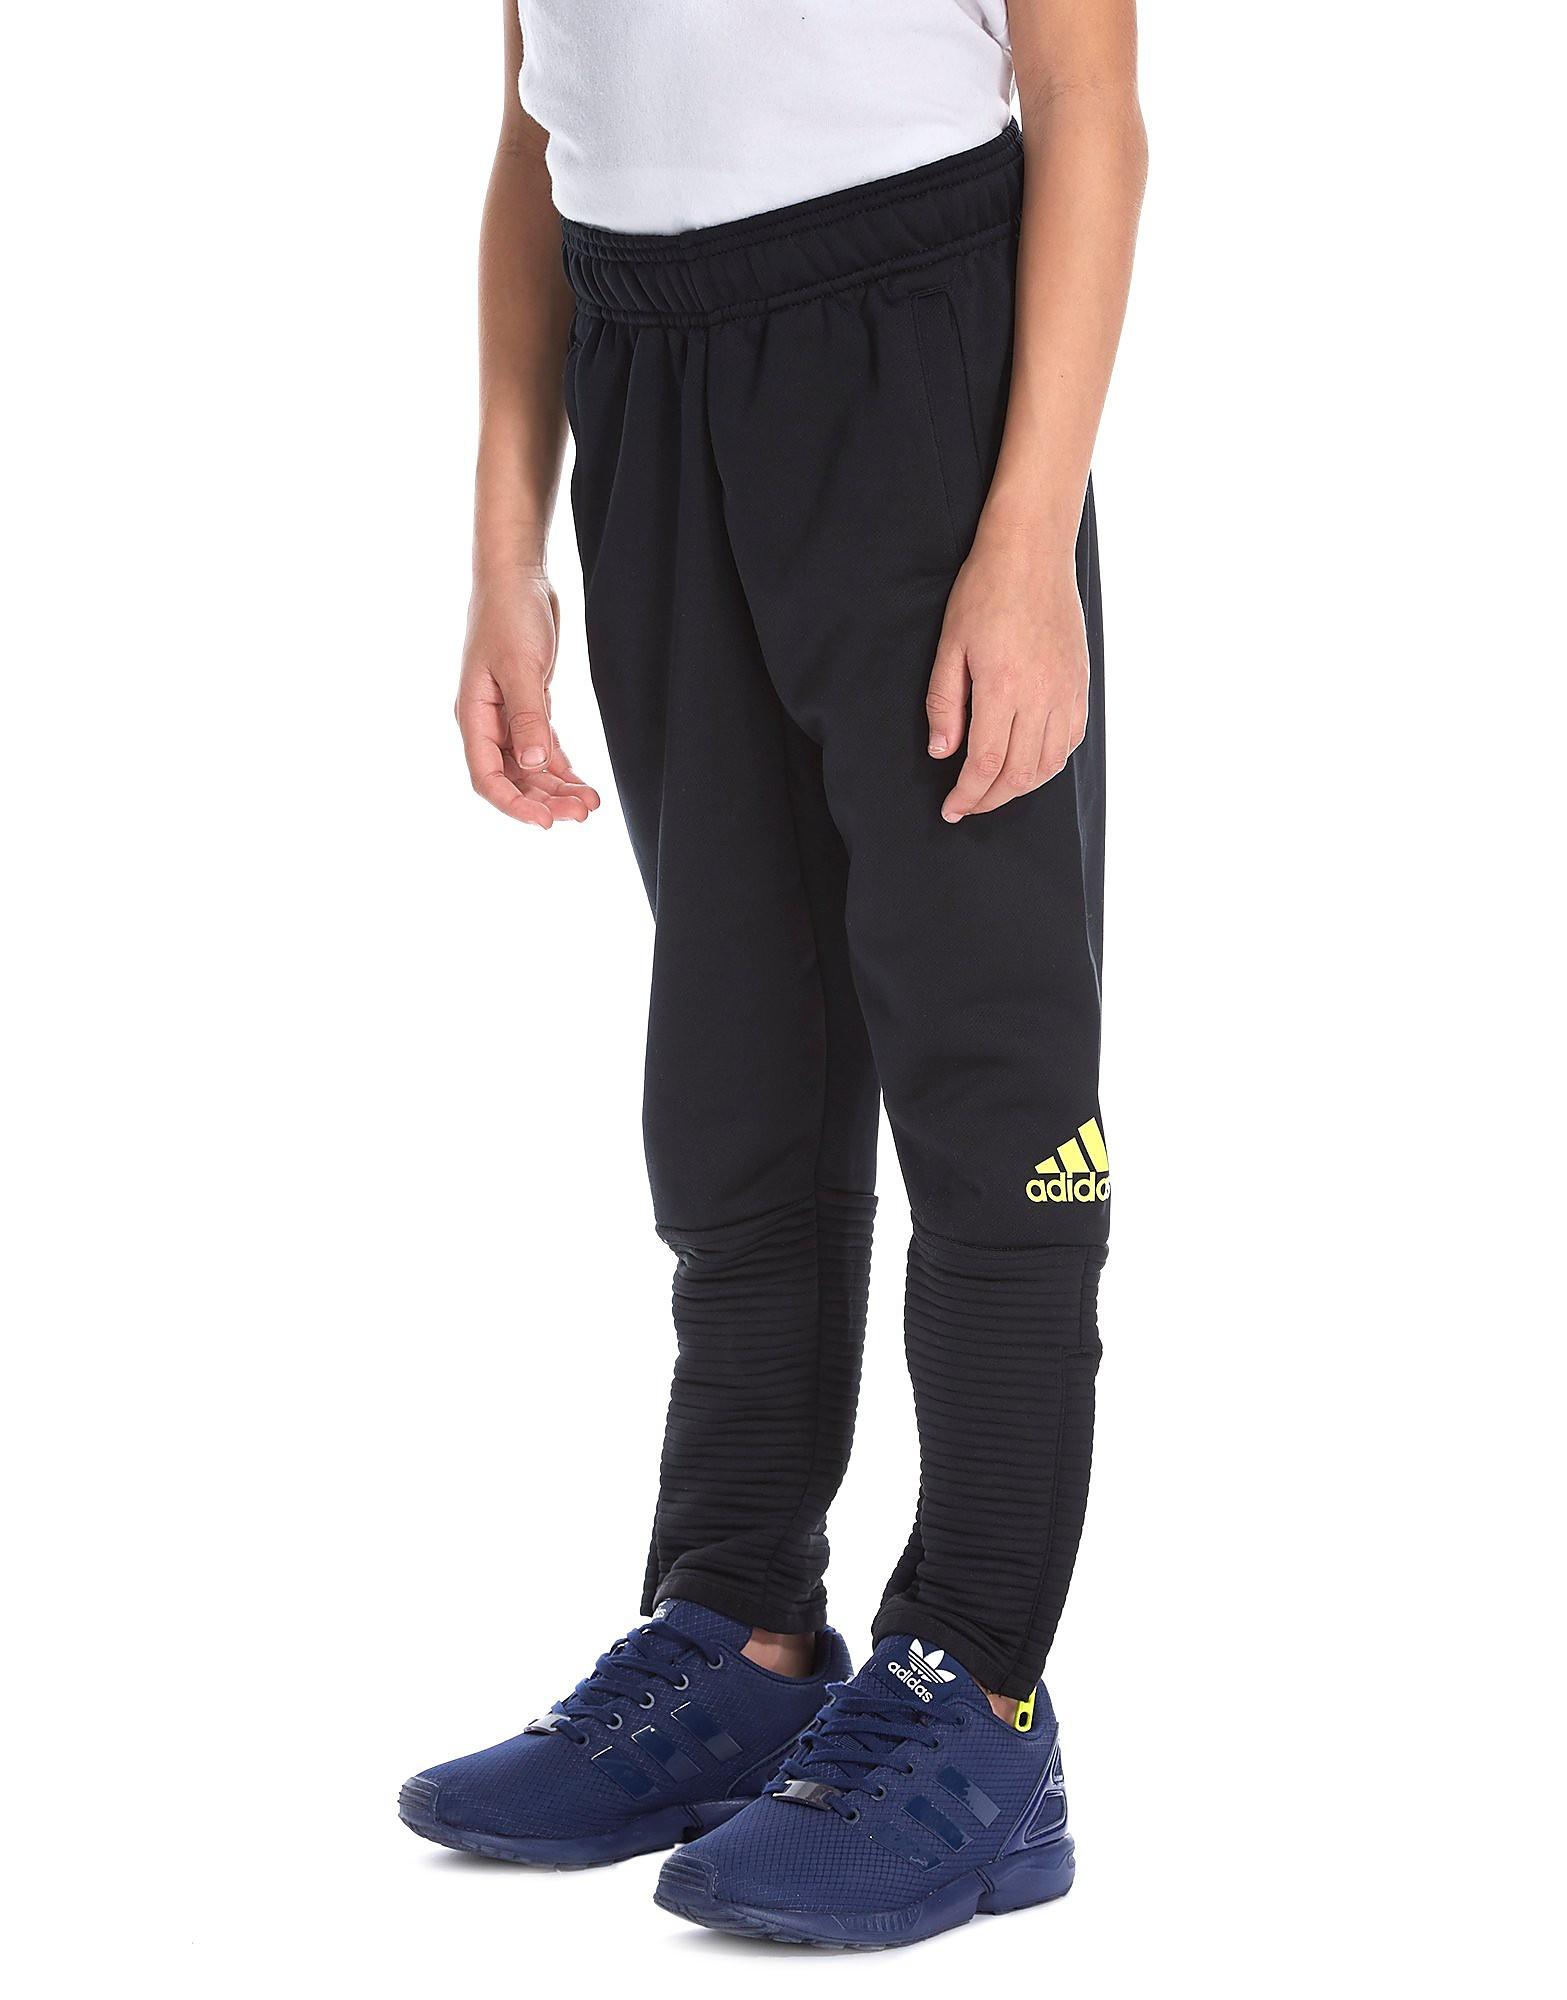 adidas pantalón Sport Tiro infantil